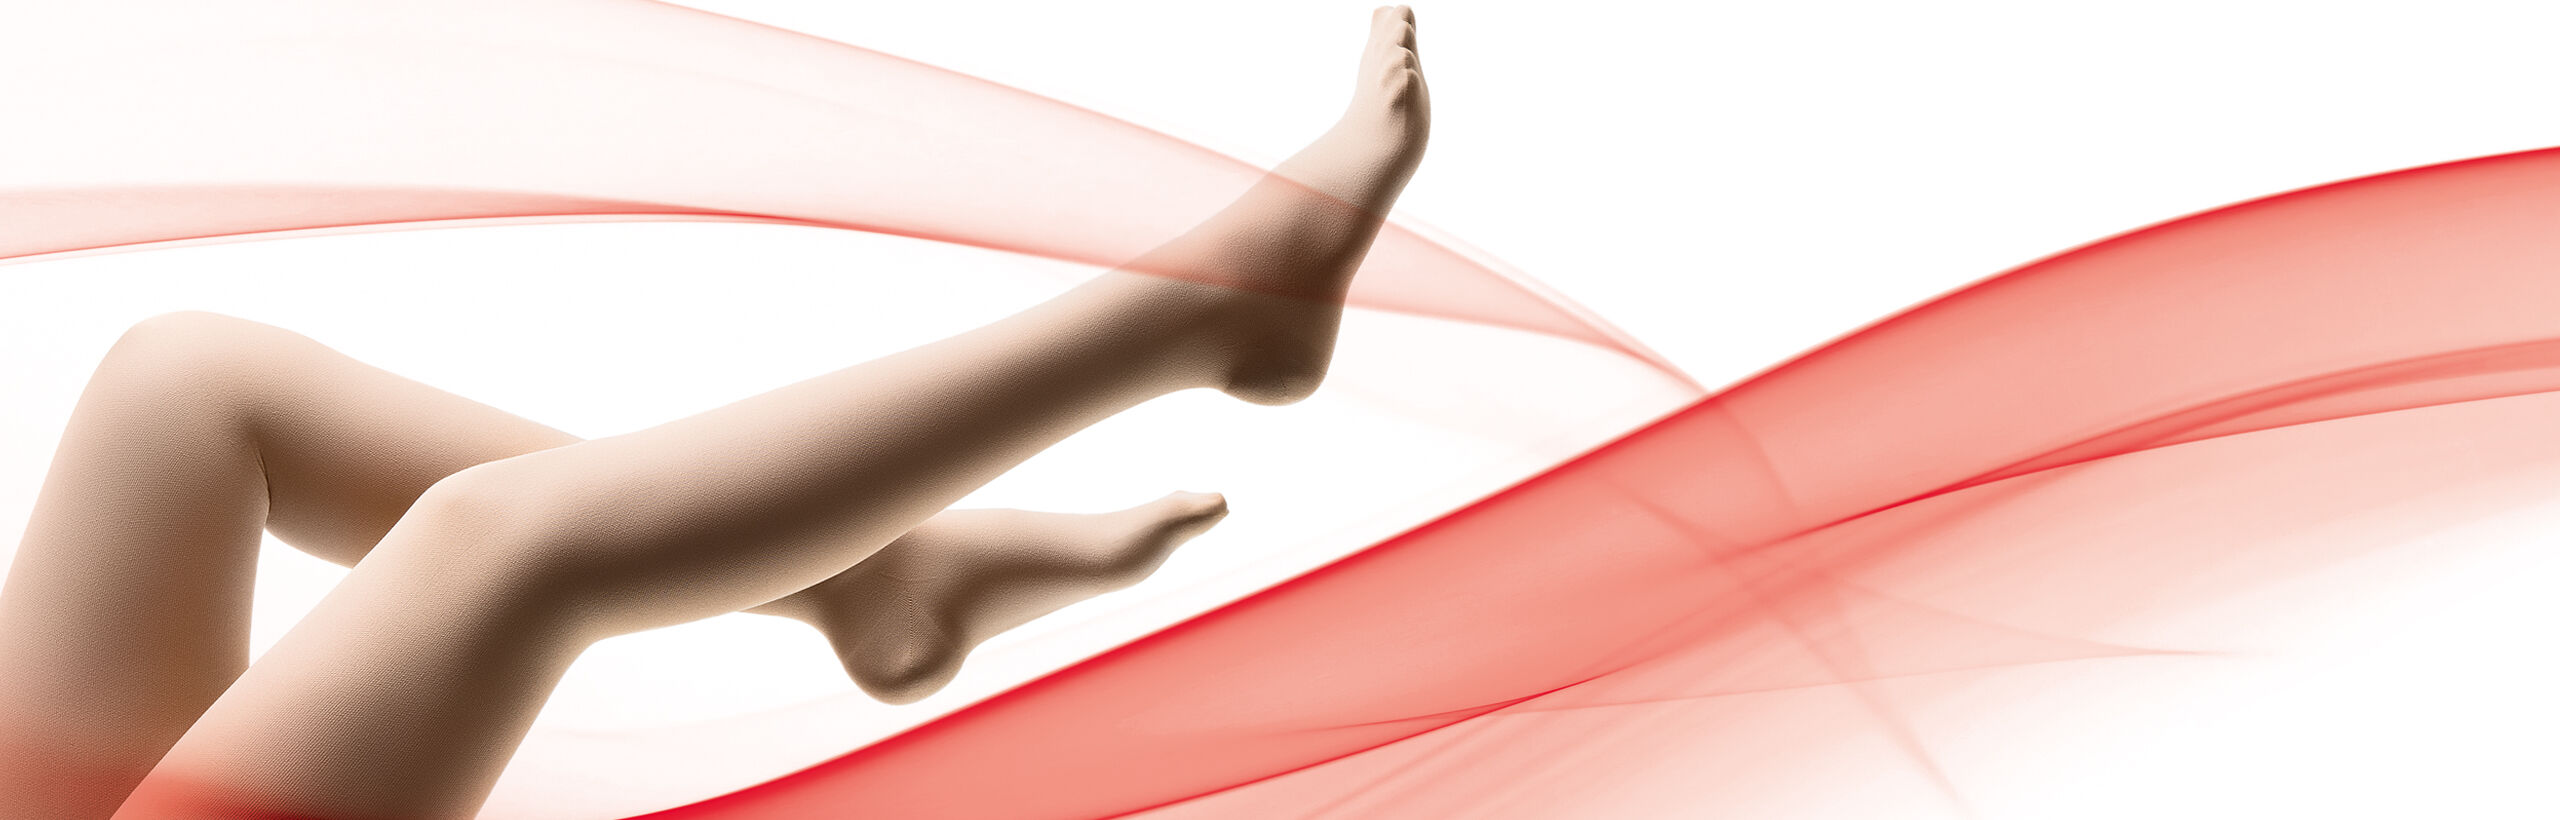 219975220a Venosan® – for lighter legs